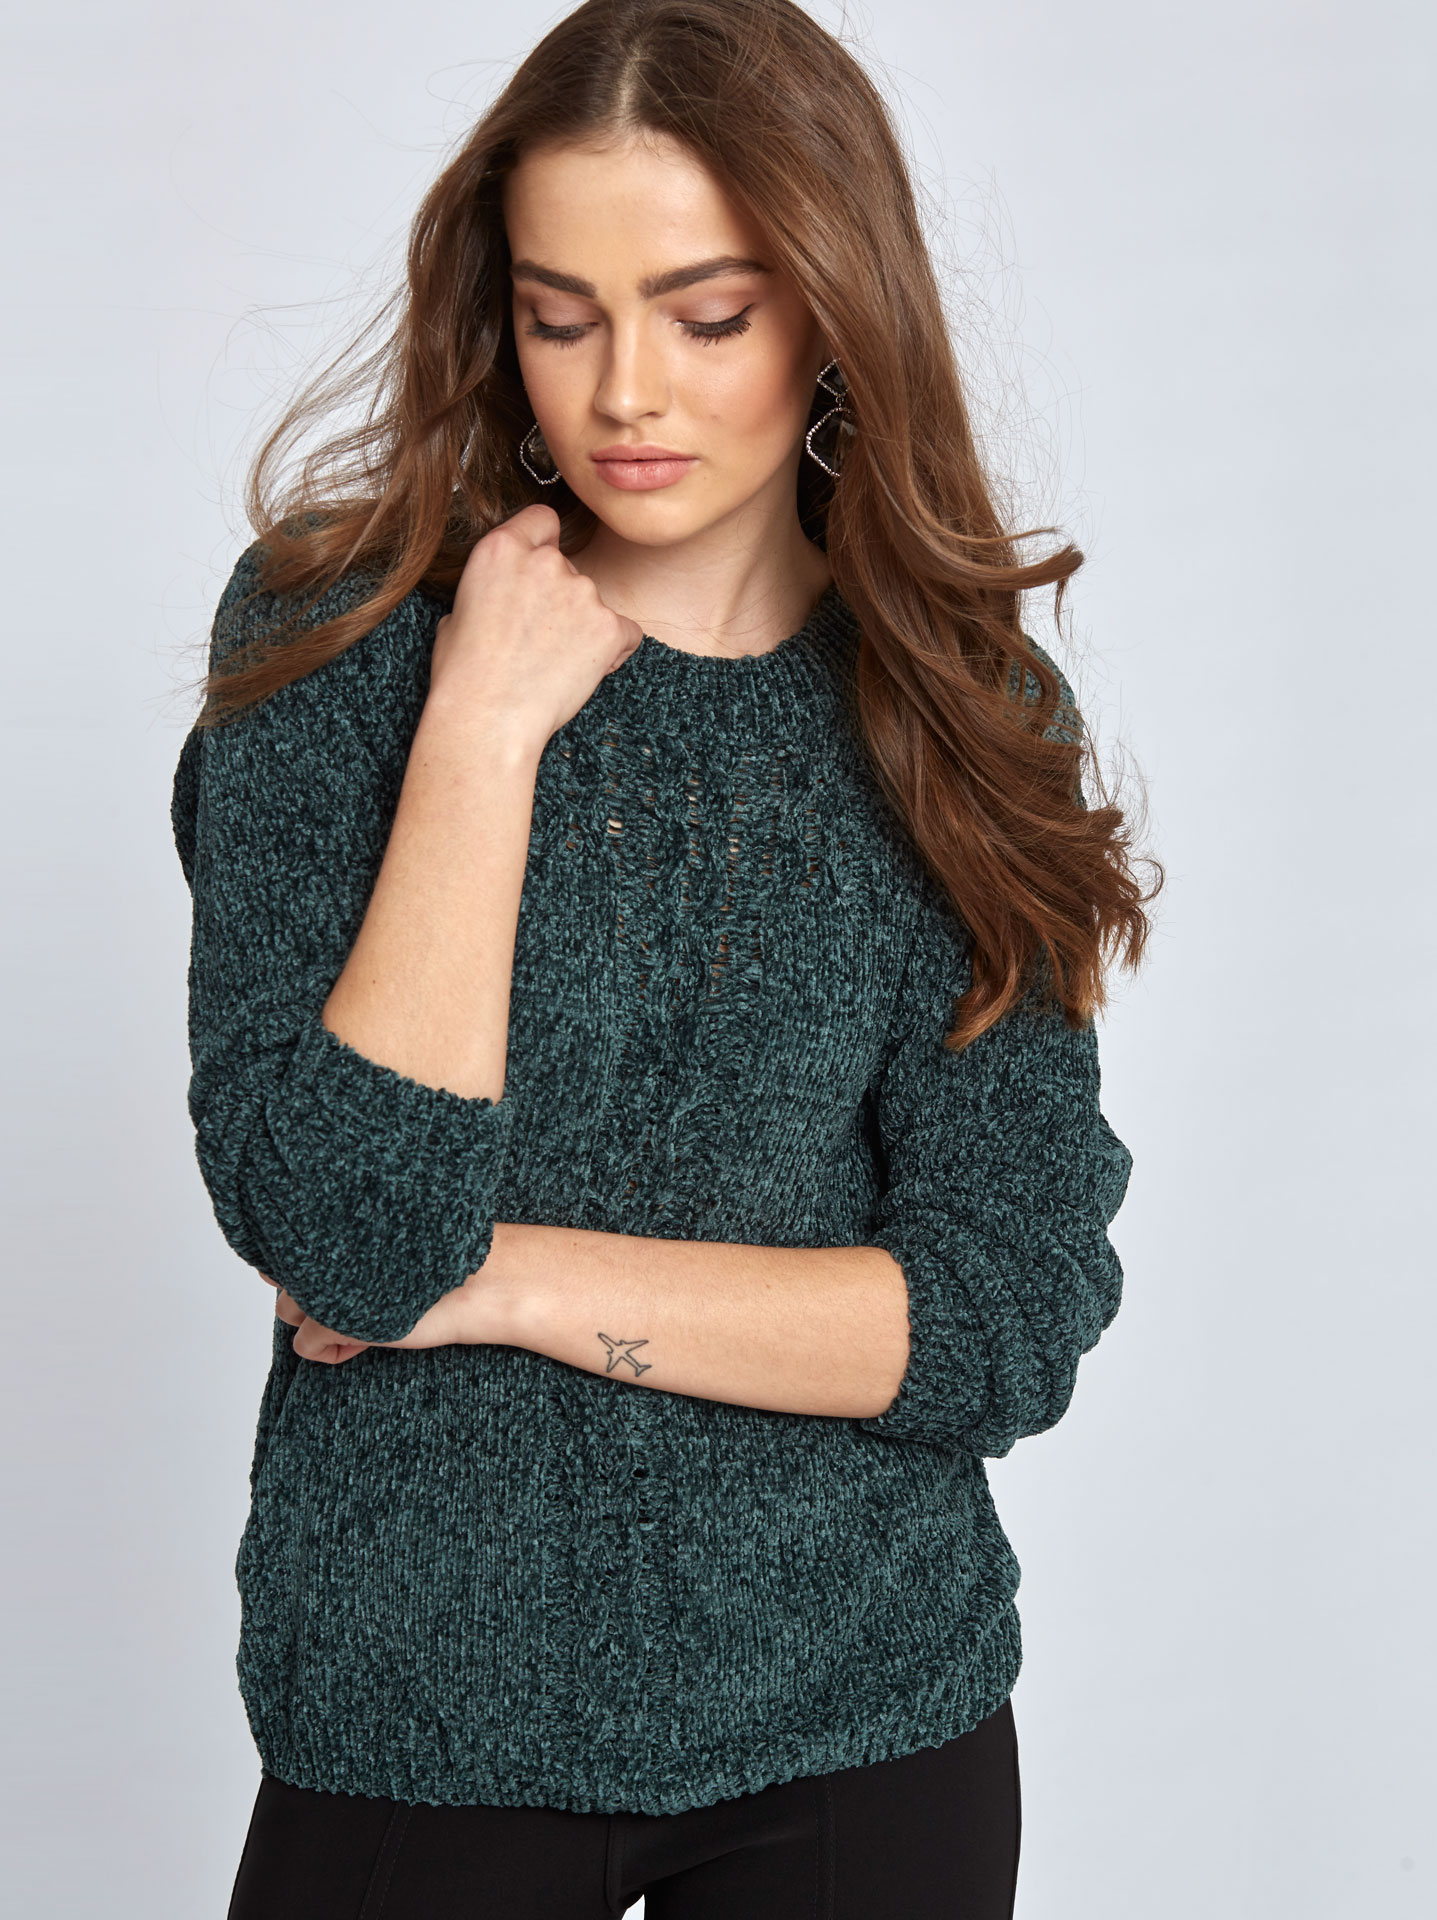 ee3b33be7545 Chenille πουλόβερ με σχέδιο σε πρασινο σκουρο